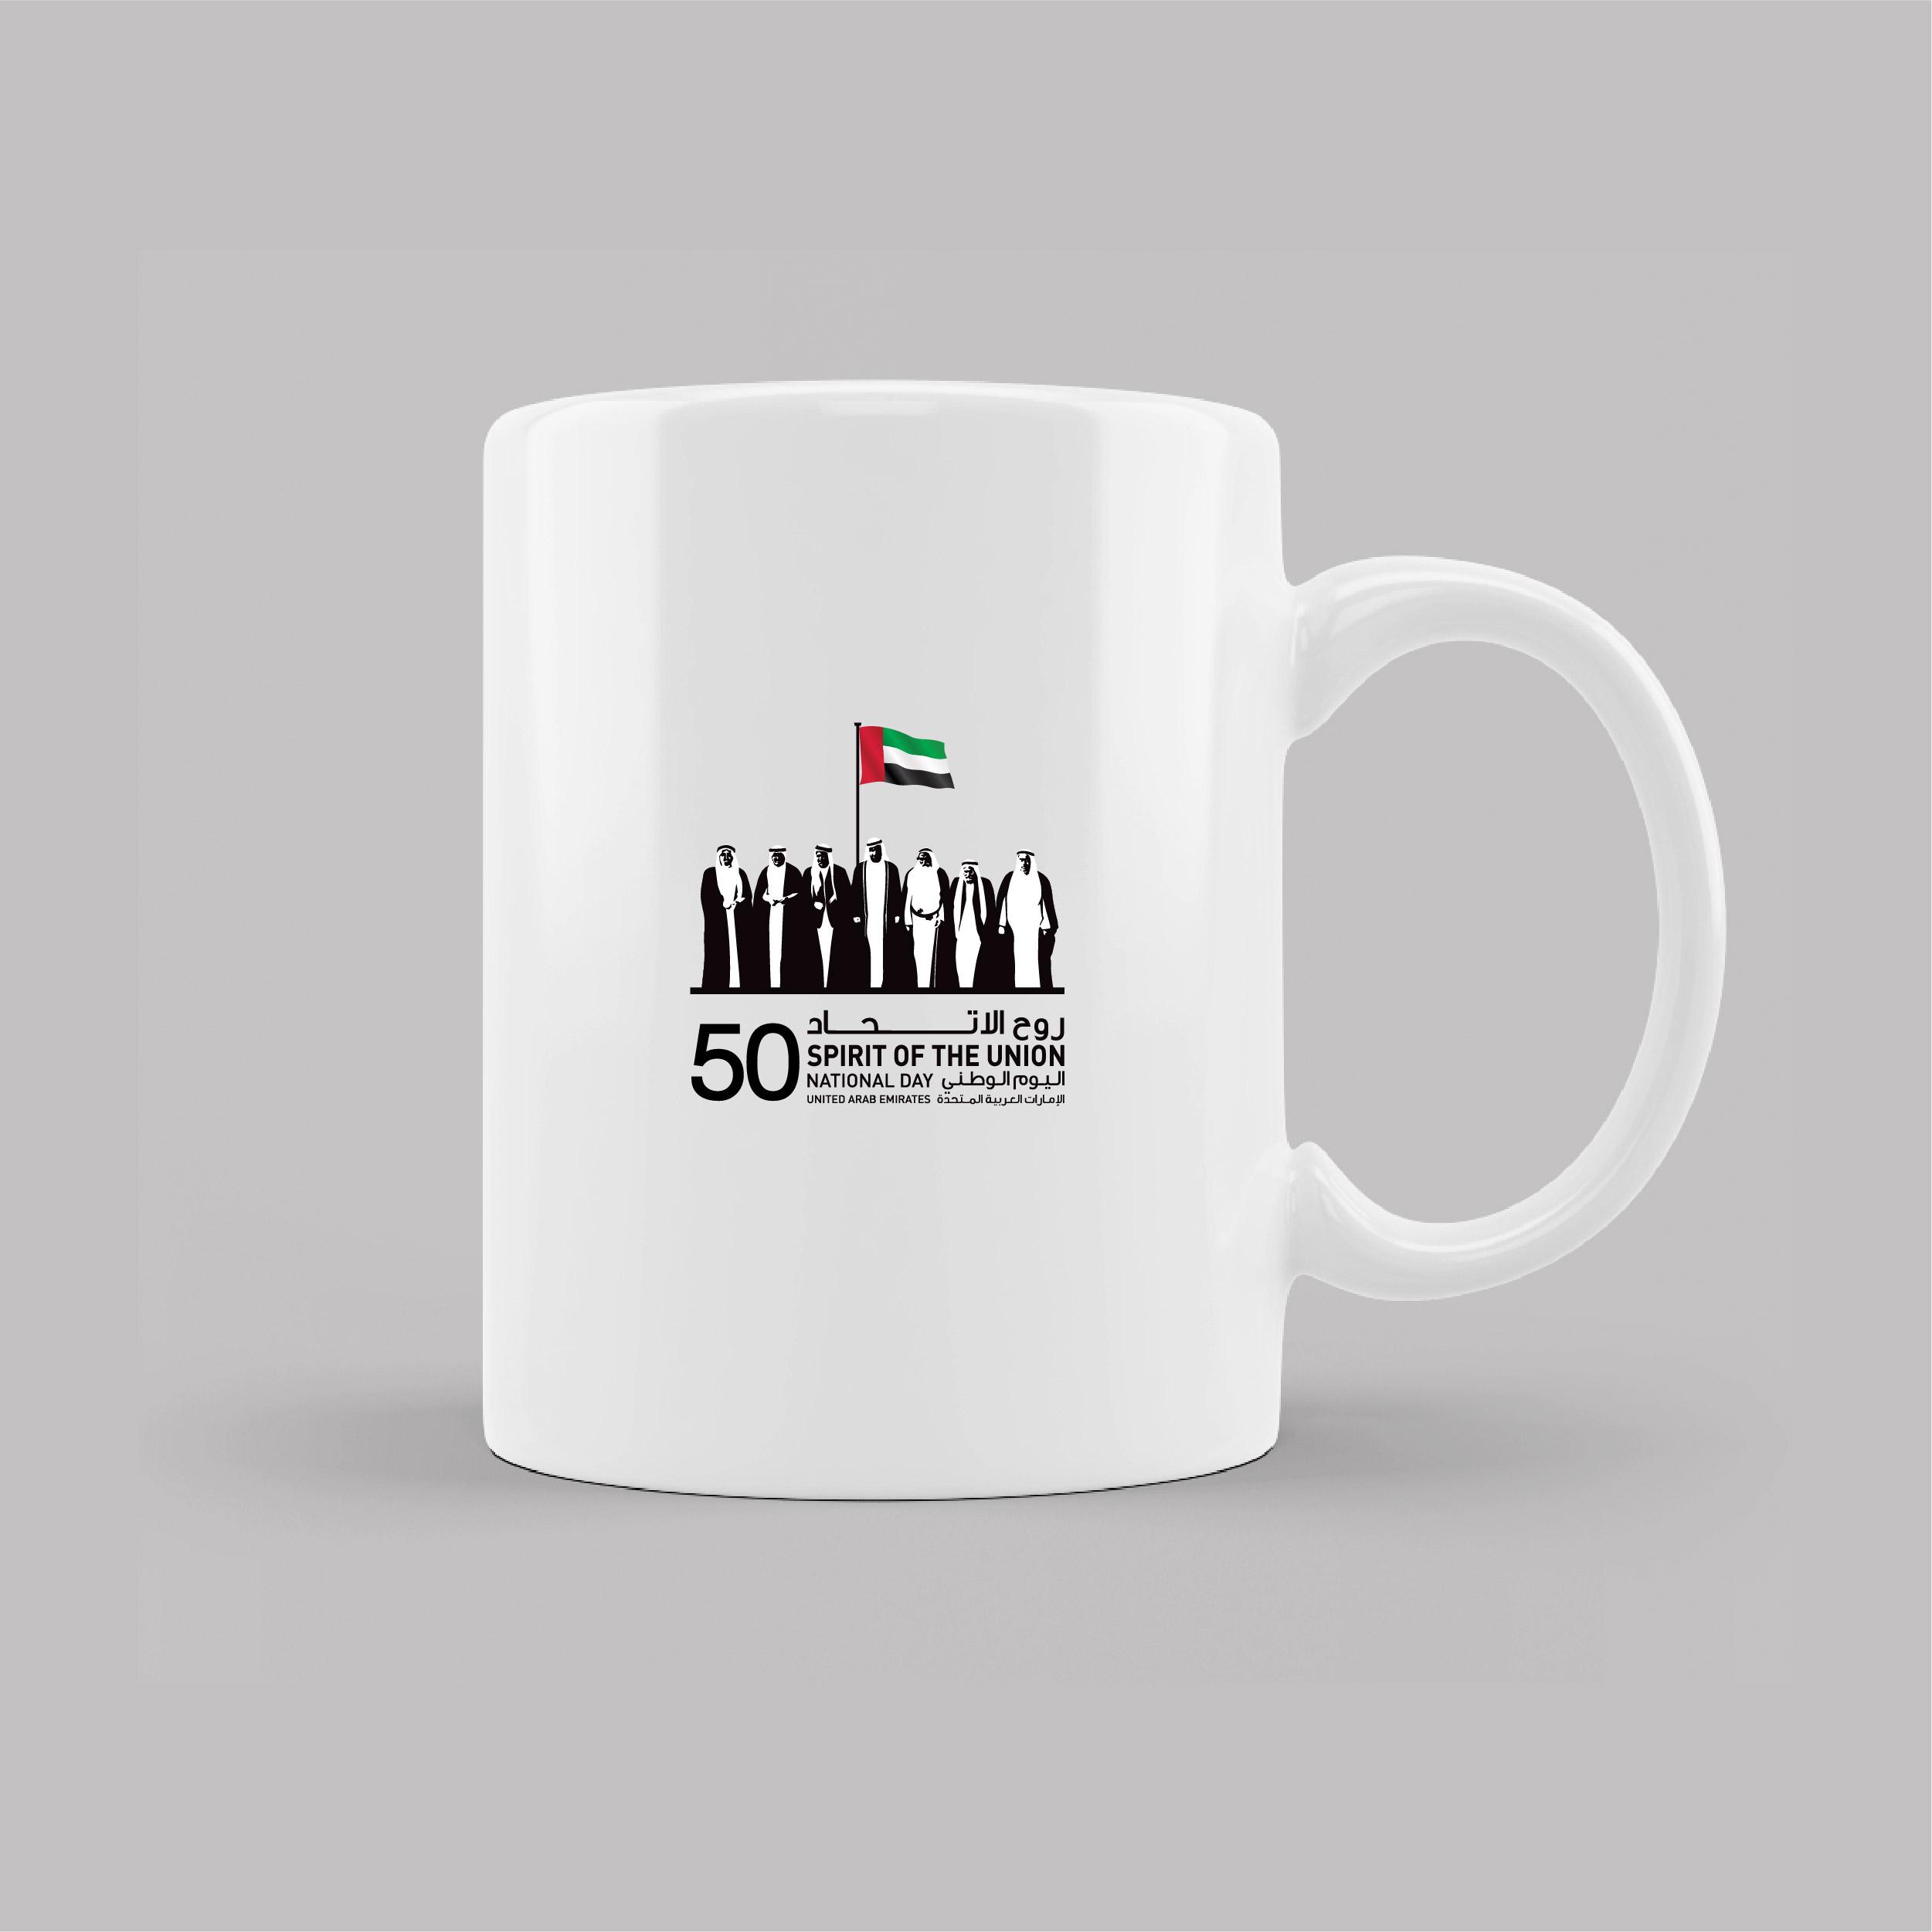 UAE National day  White Mug With Kings Sprit of Union